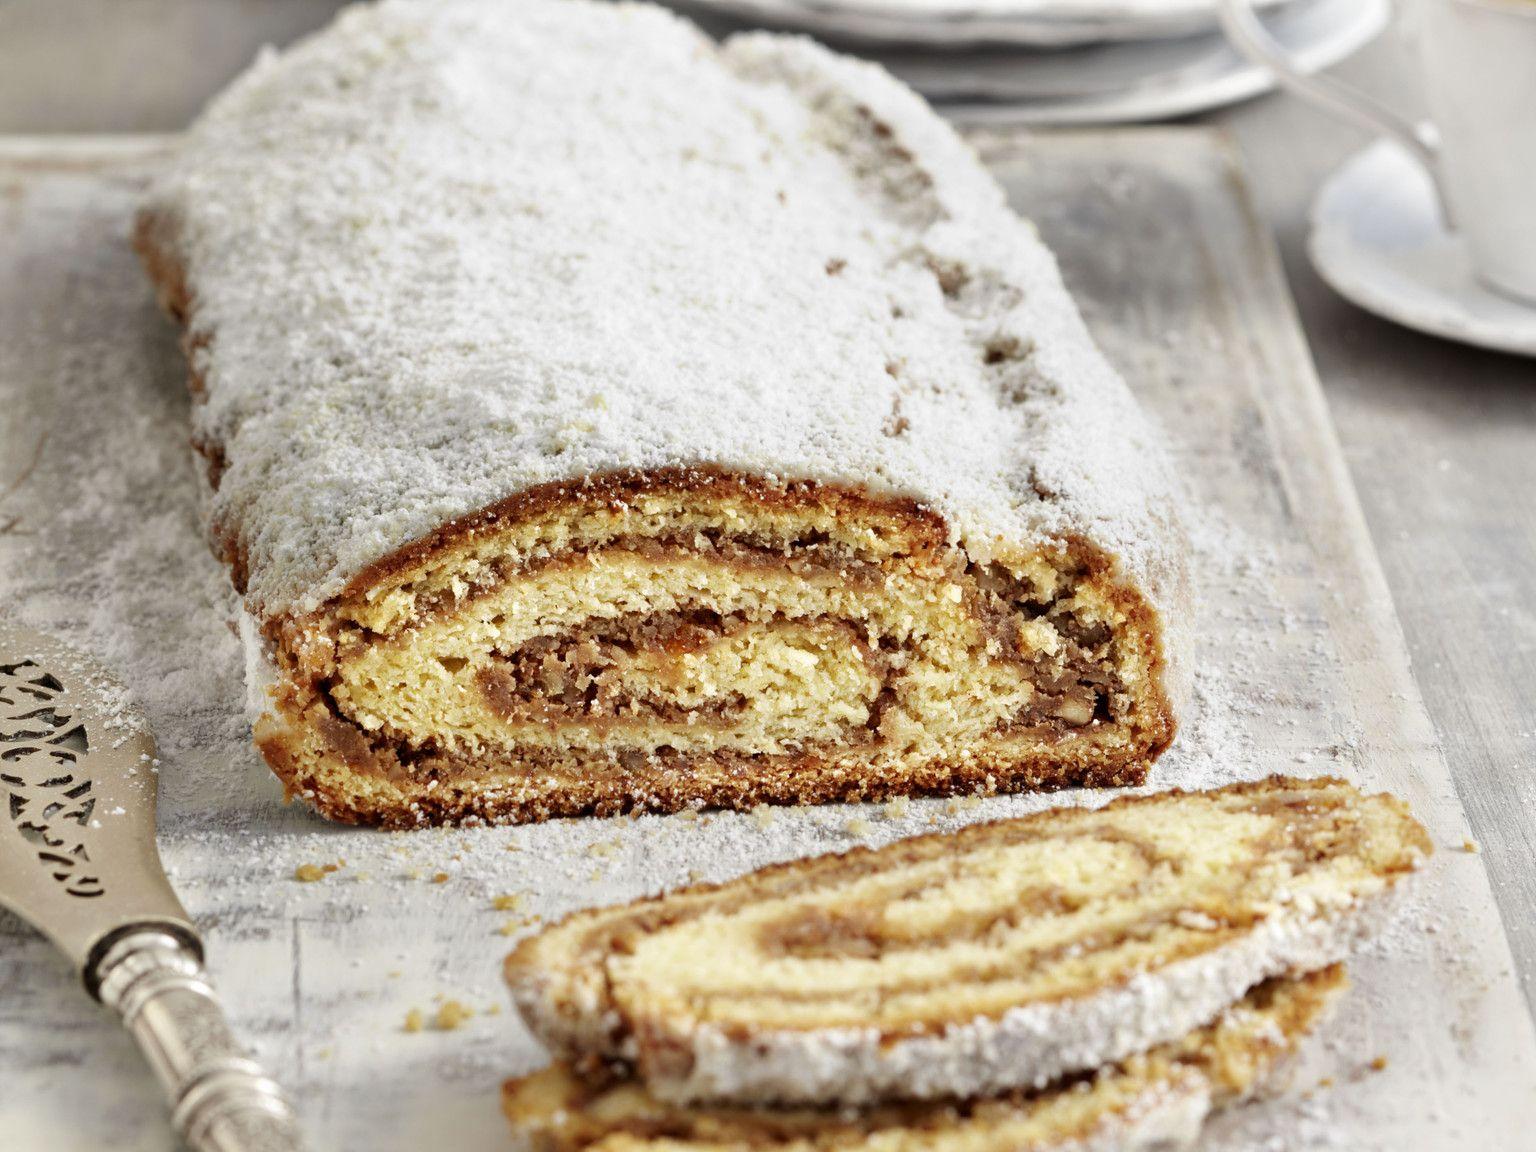 Nuss-Stollen - saftig & lecker | Die besten Backrezepte mit Gelinggarantie #cinnamonsugarcookies